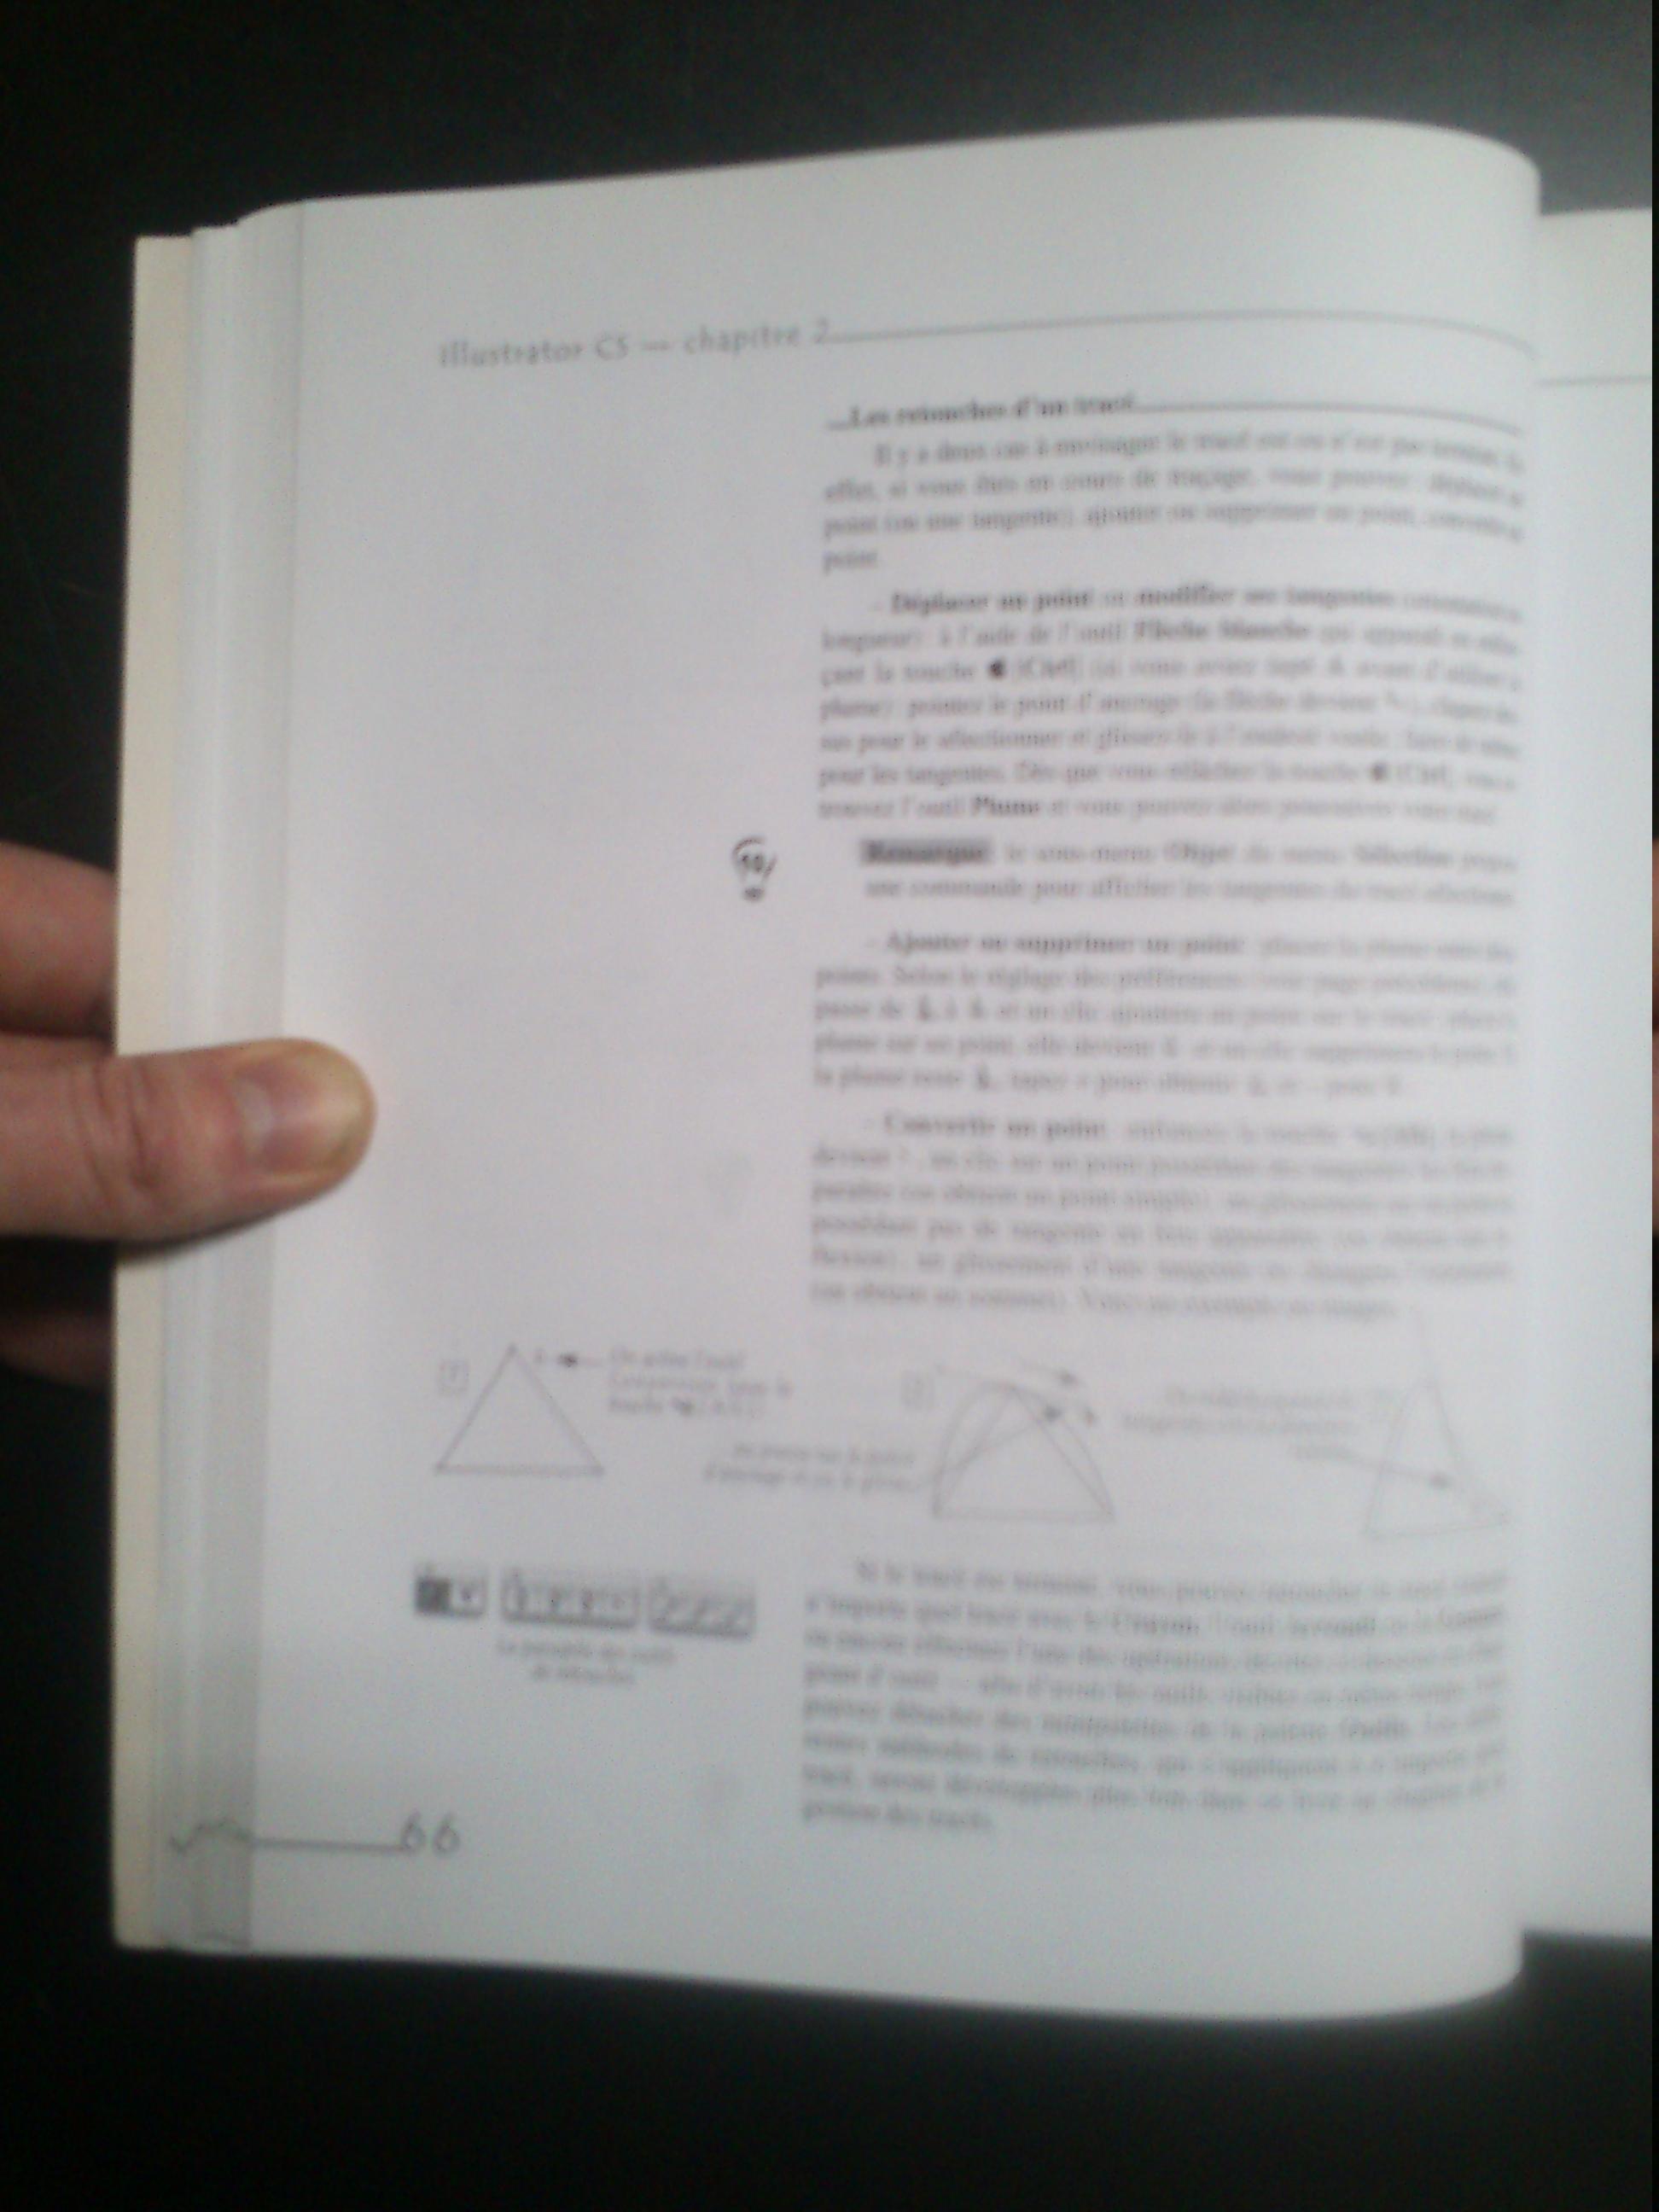 other/photos bibliothèque cambre/DSC_0415.jpg